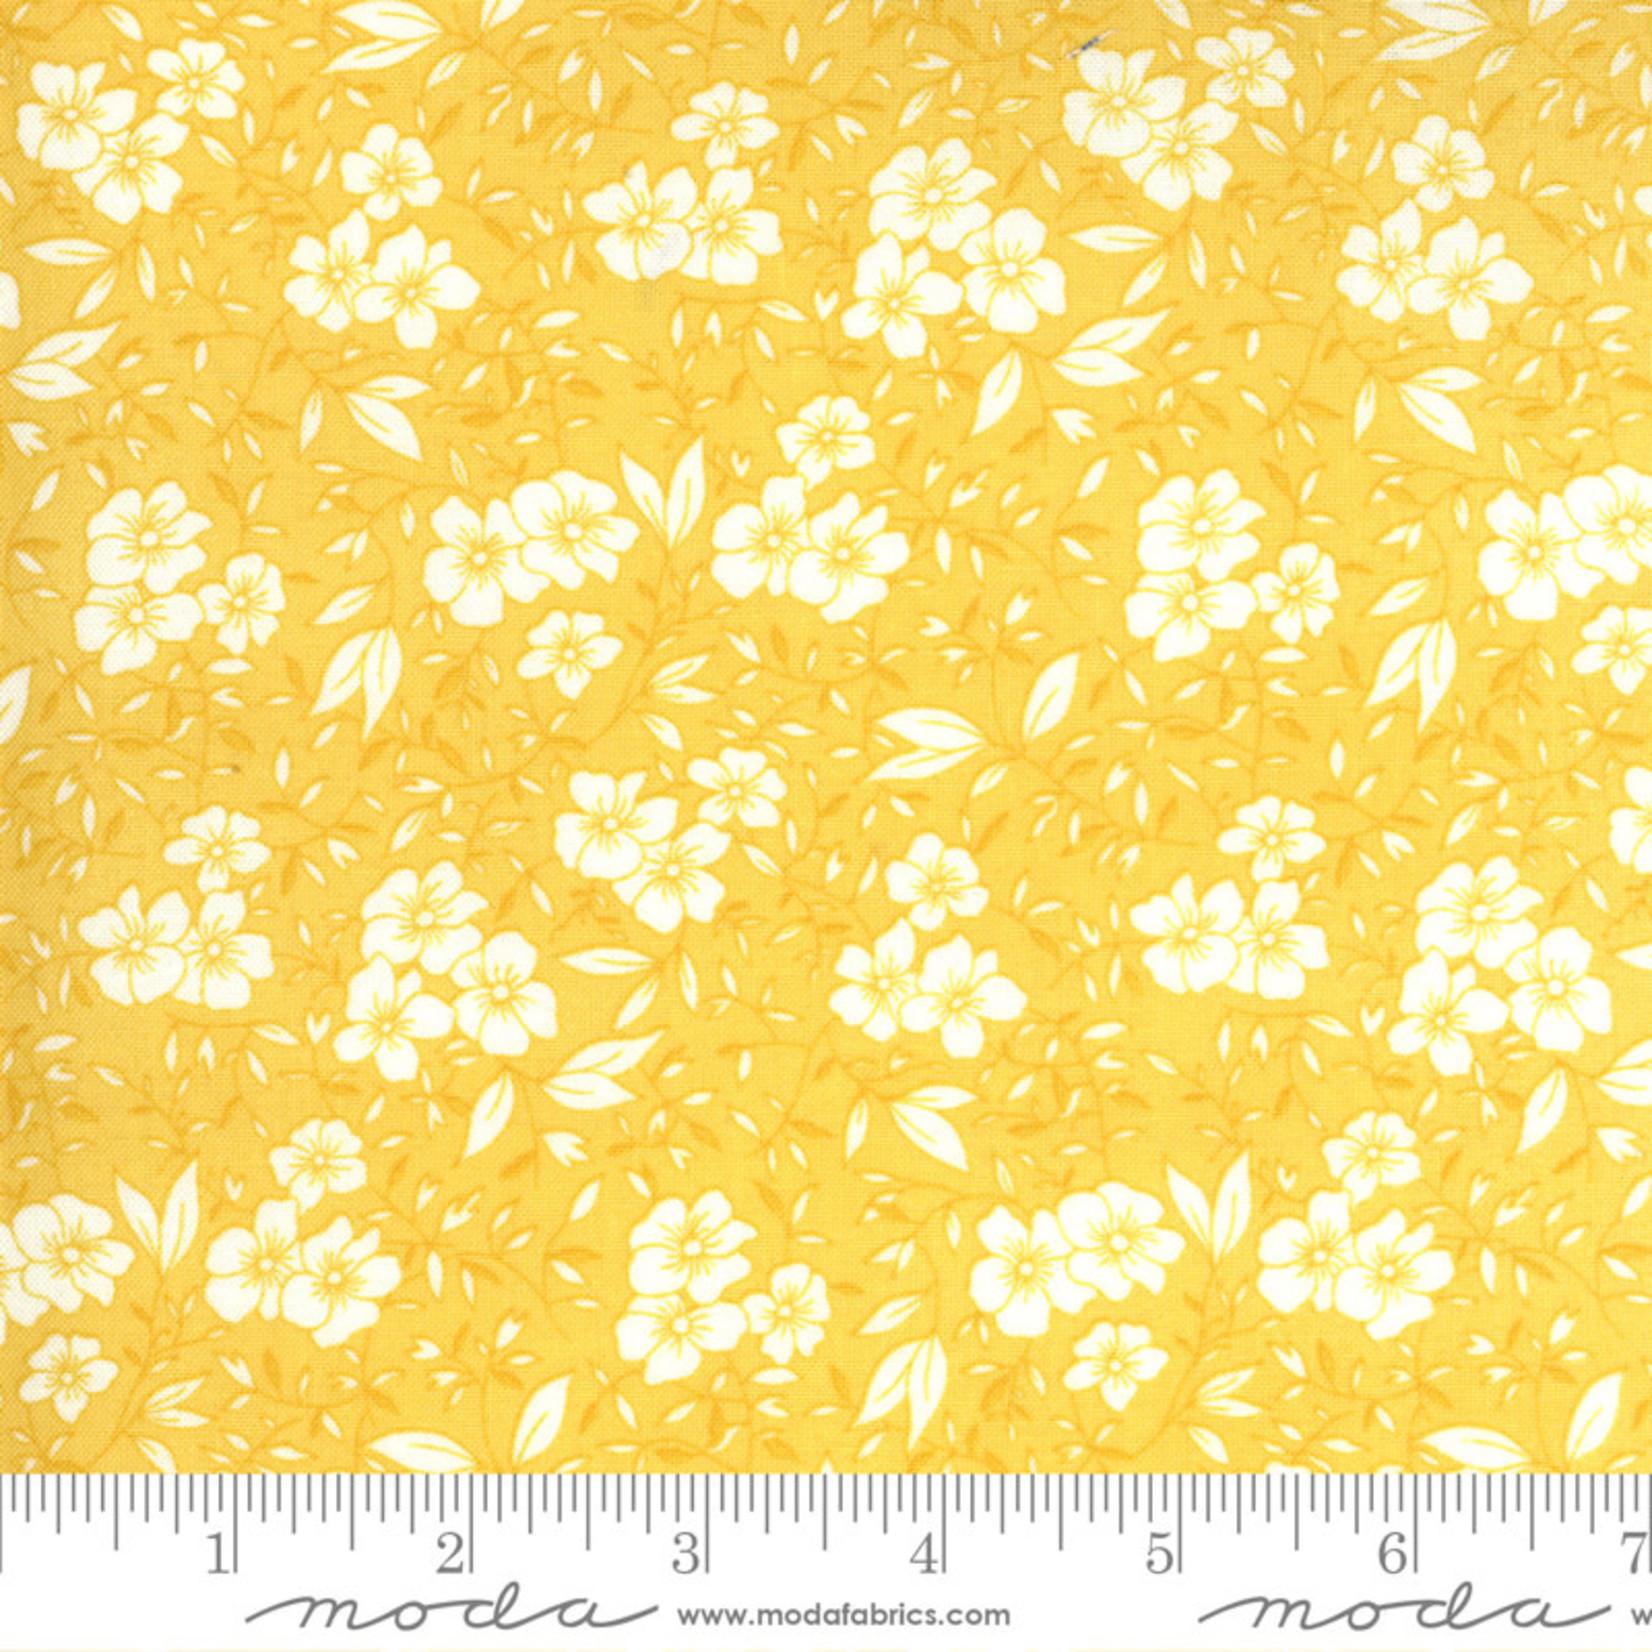 Chloe's Closet 30s Playtime, Friendly Blooms Flora, Buttercup 33592-24 $0.20 per cm or $20/m